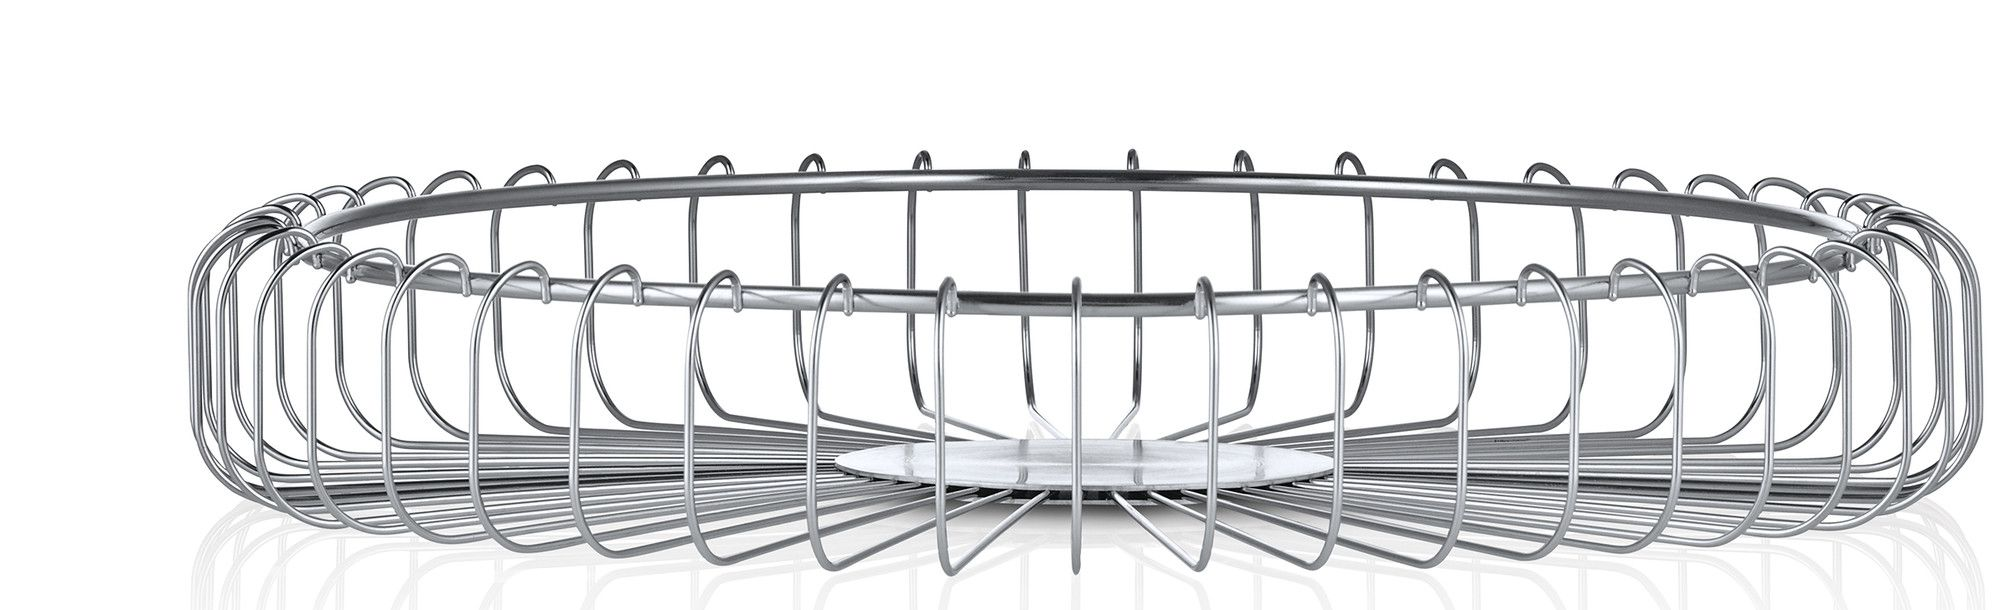 Estra Wire Fruit Basket Stainless Steel Wire Steel Stainless Steel